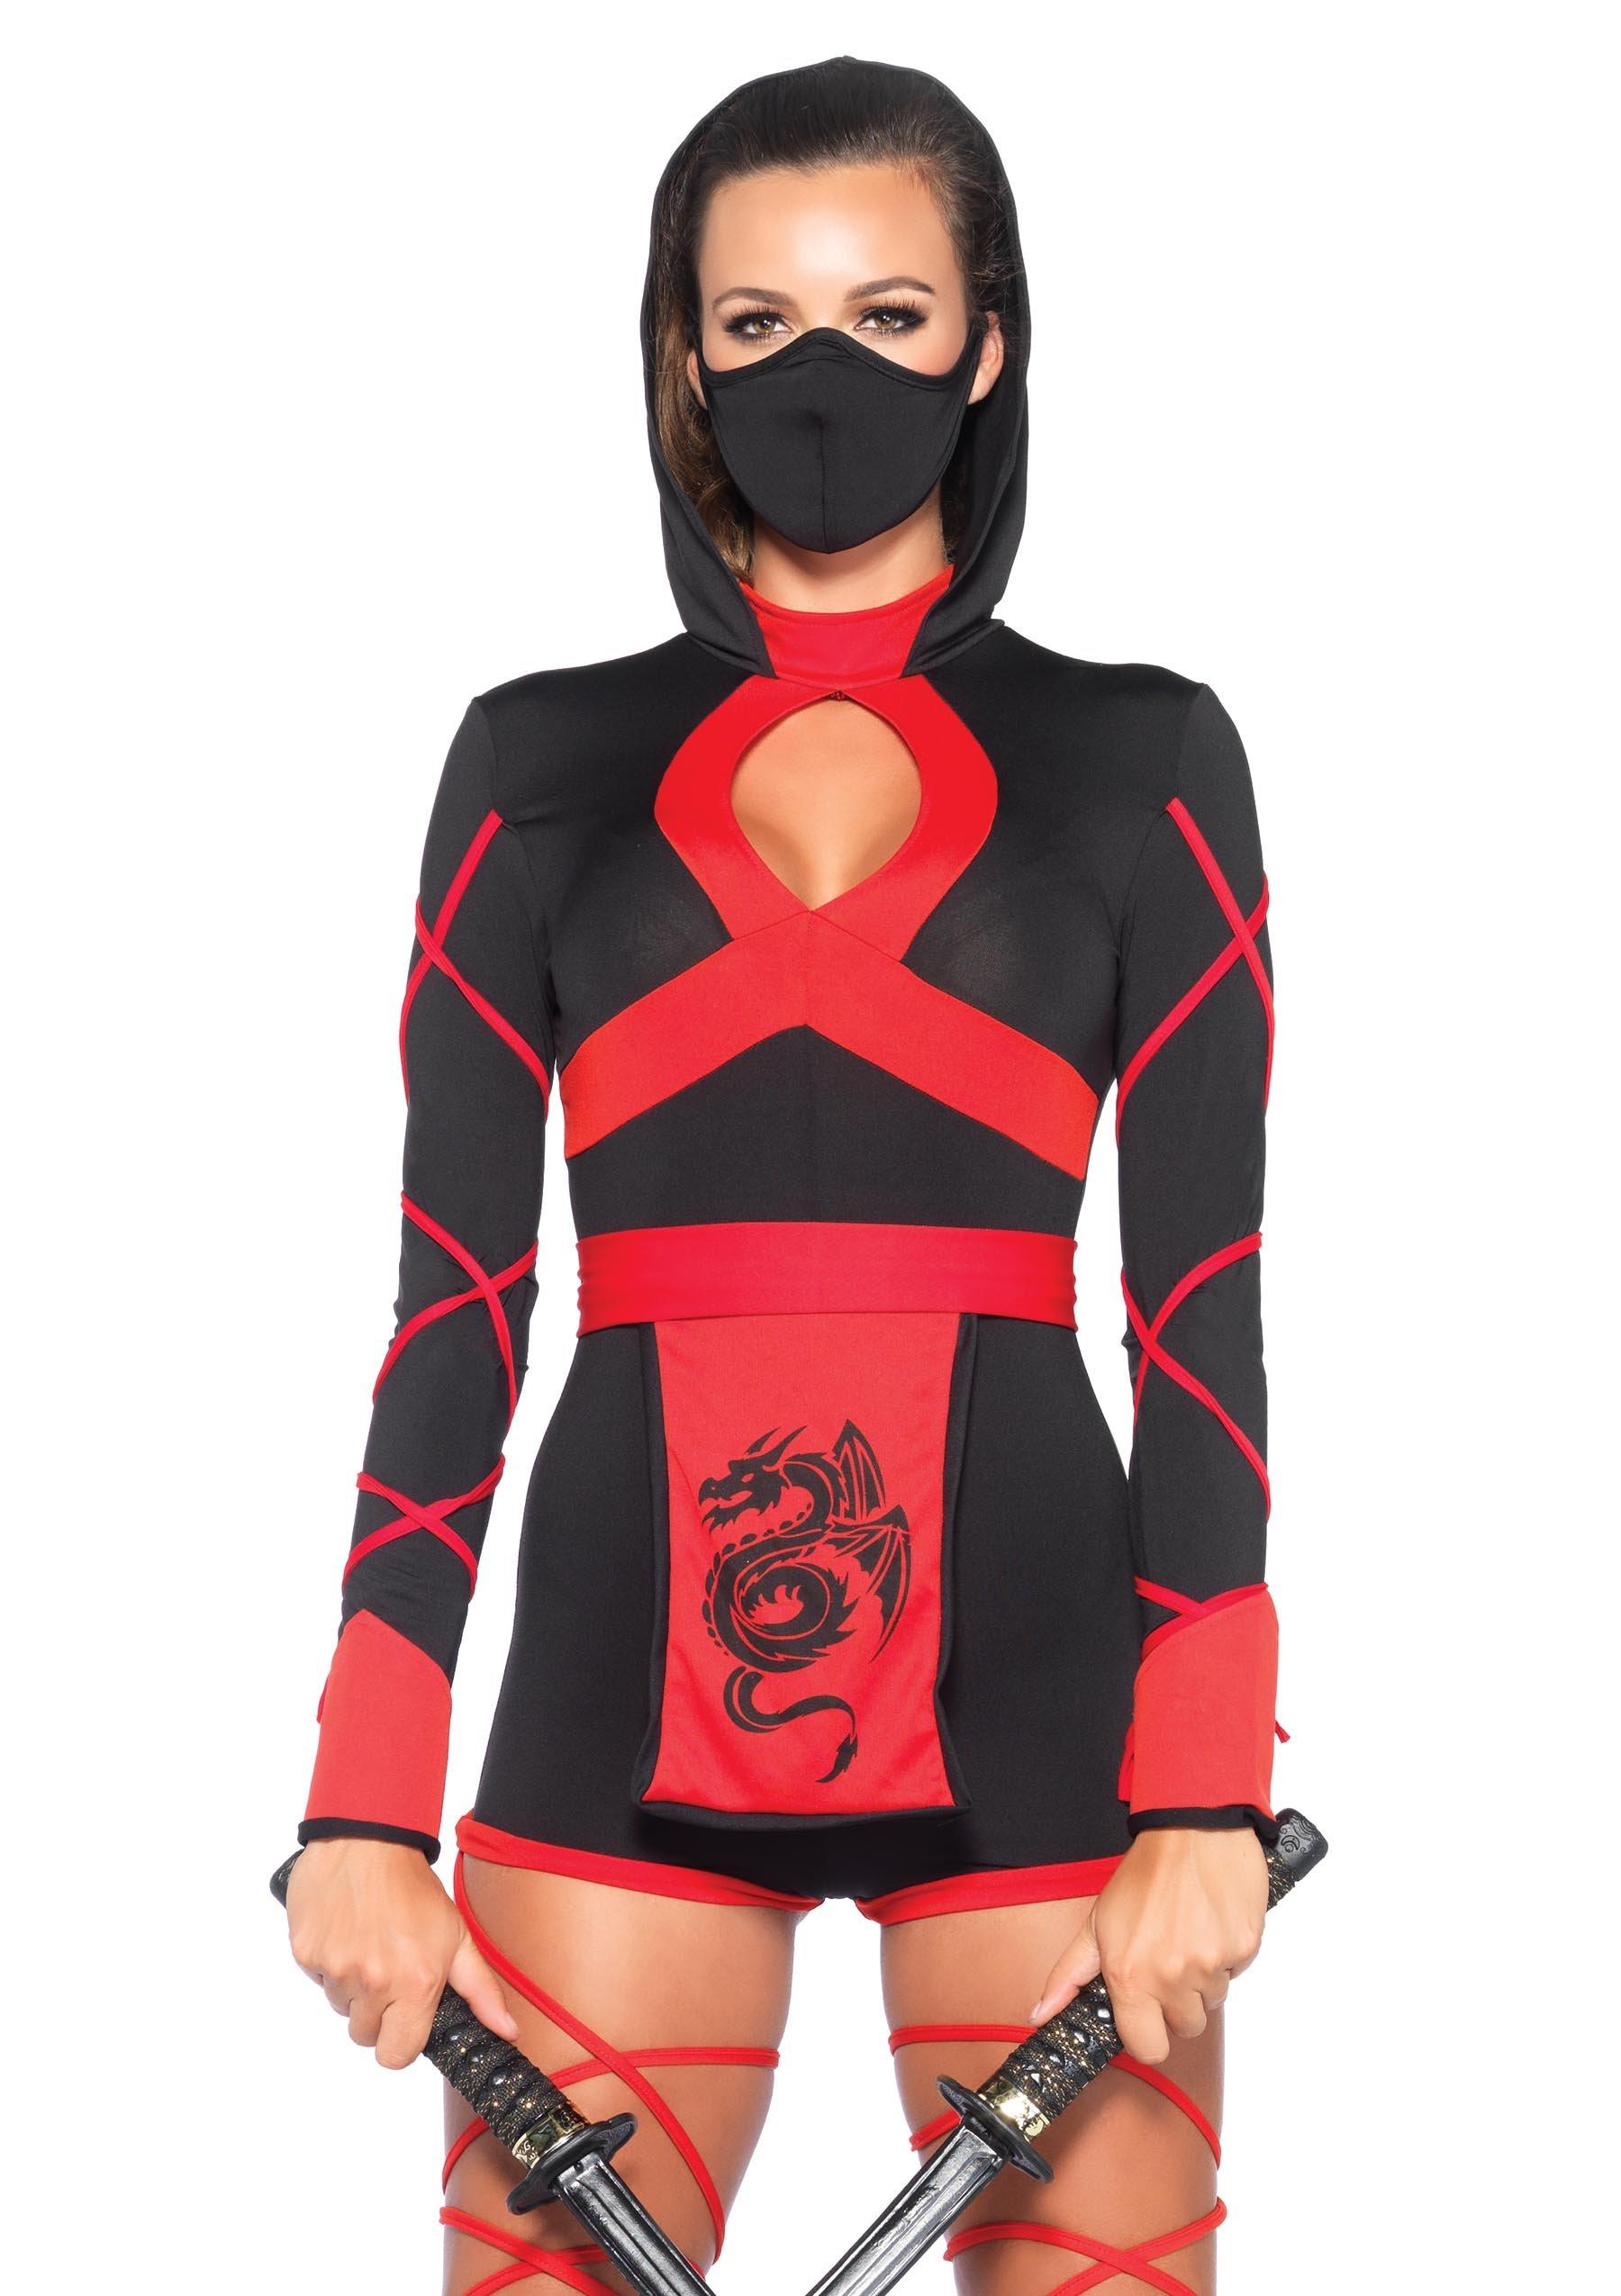 Leg Avenue Women's 3 Piece Dragon Ninja Costume, Black/Red, Medium